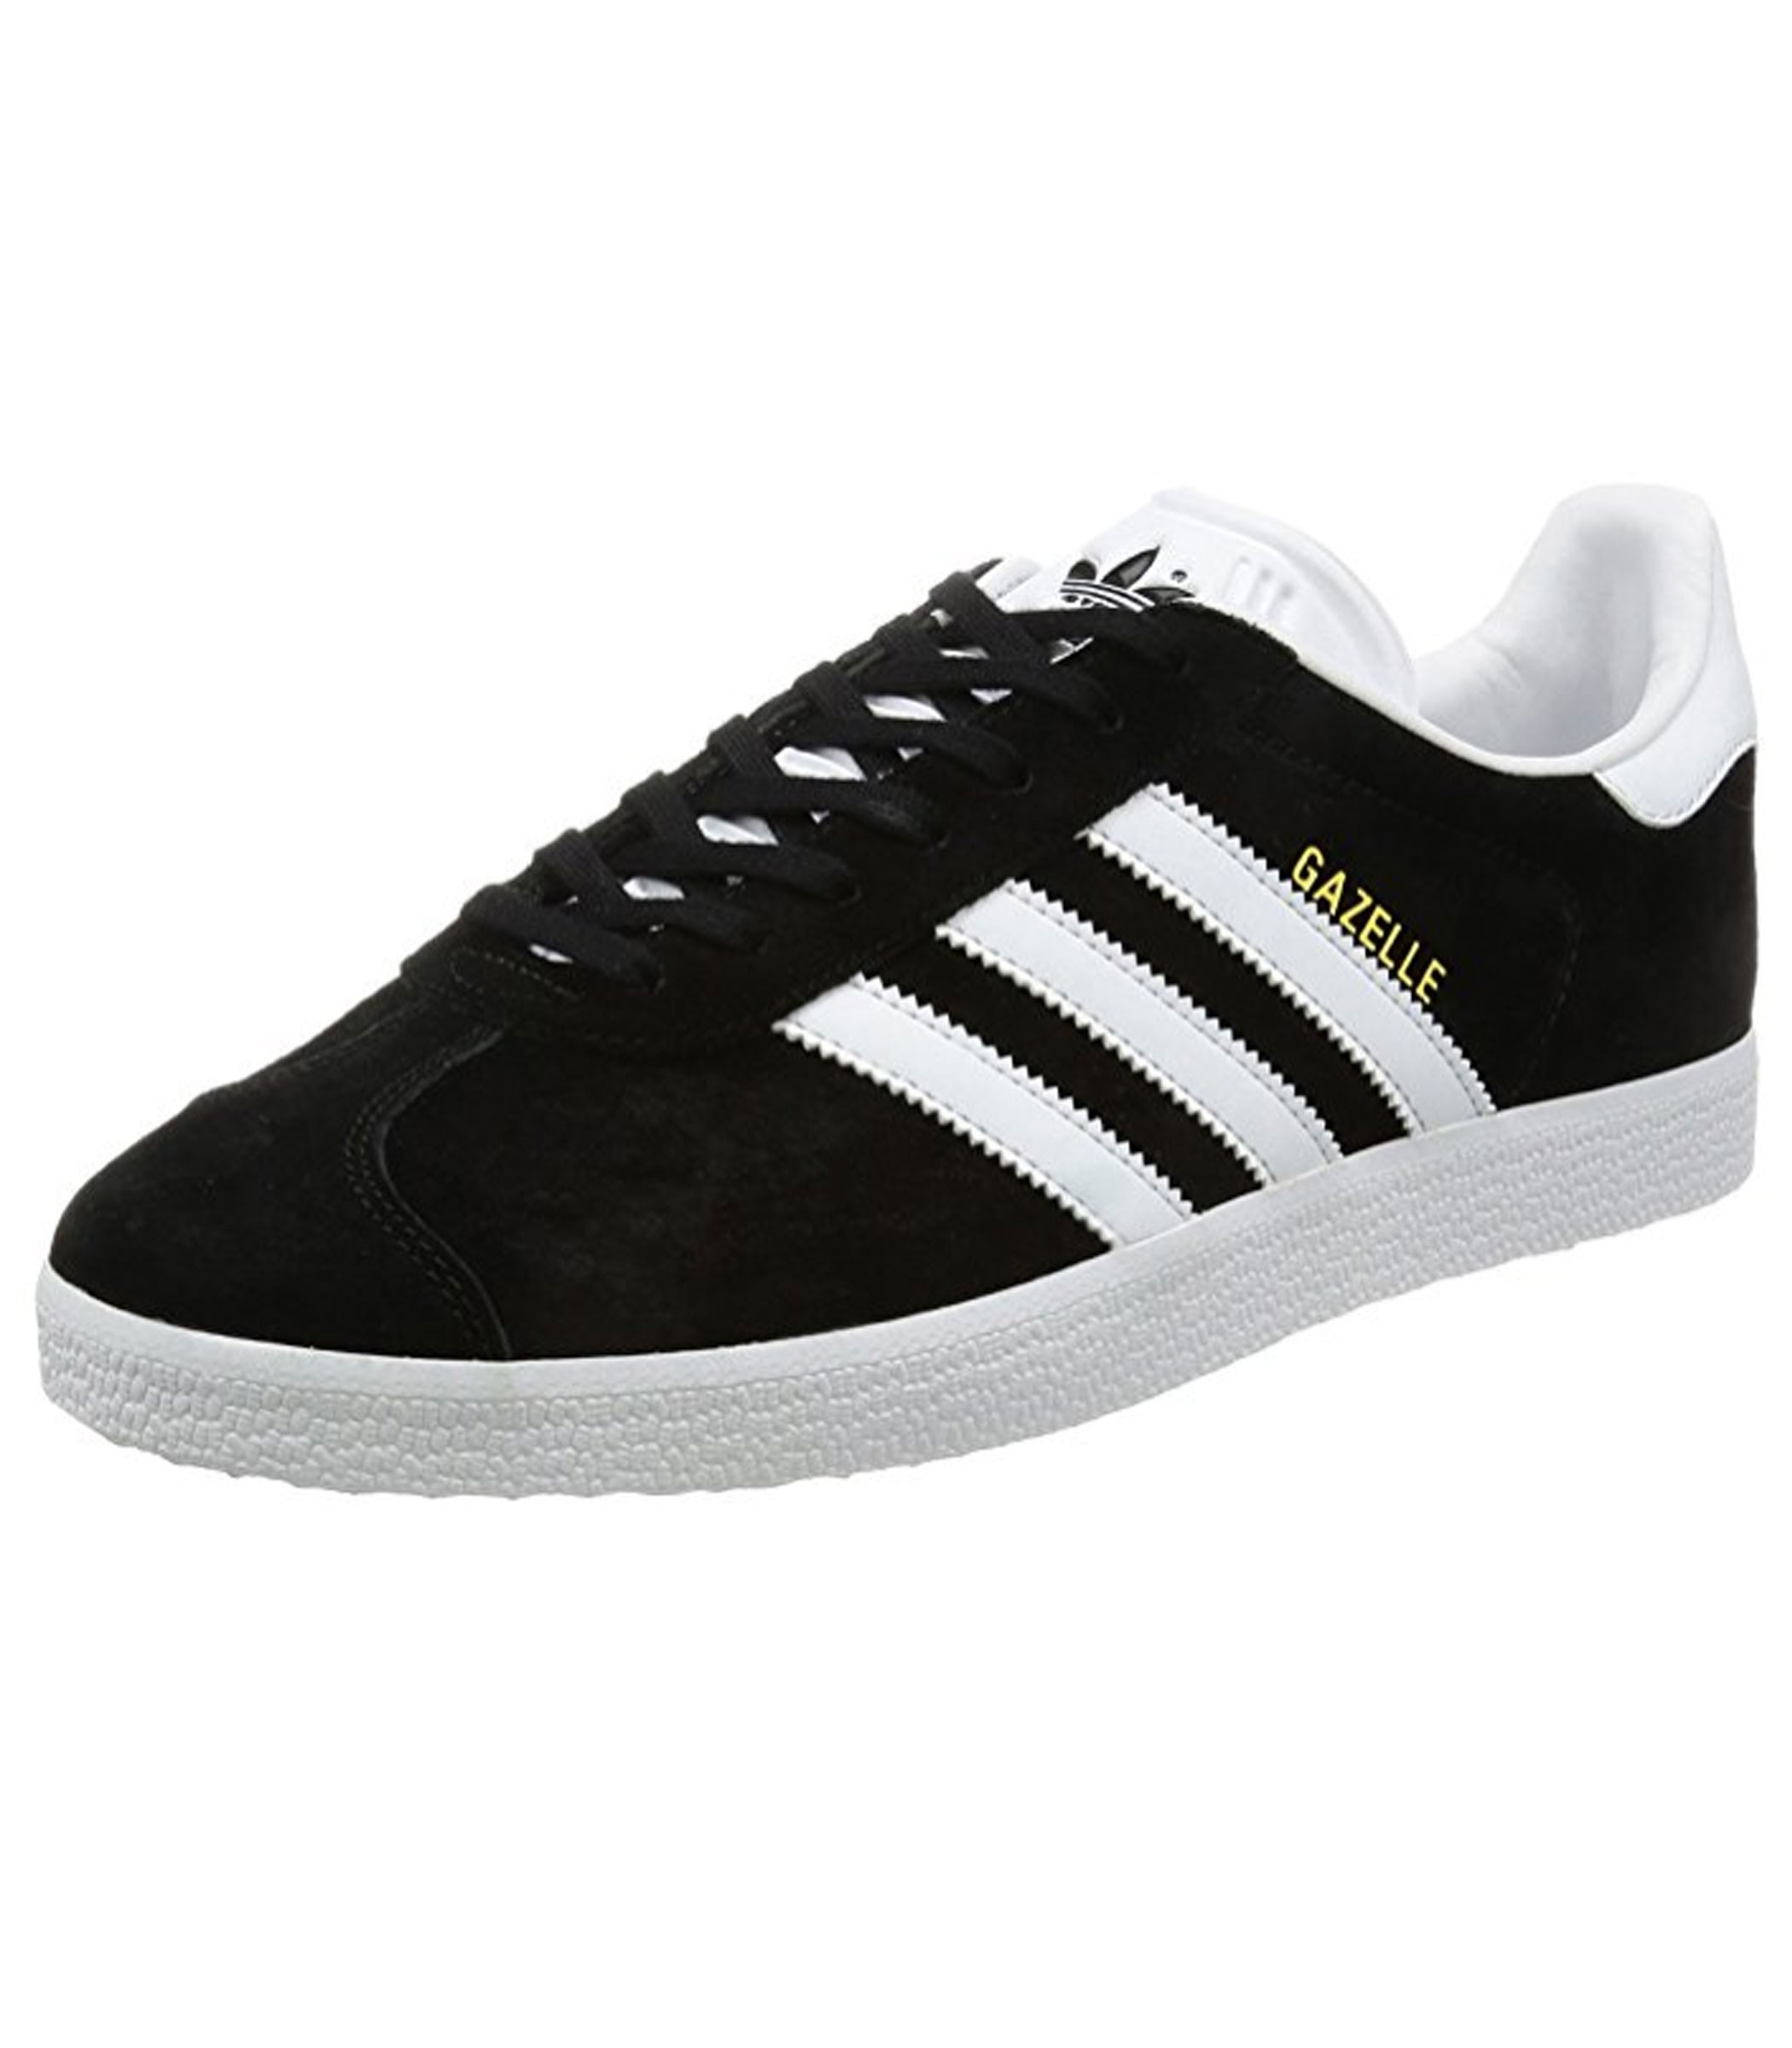 Bb2502 Da Adidas Scarpe Rif Gazelle Ginnastica Donna 80dqBY